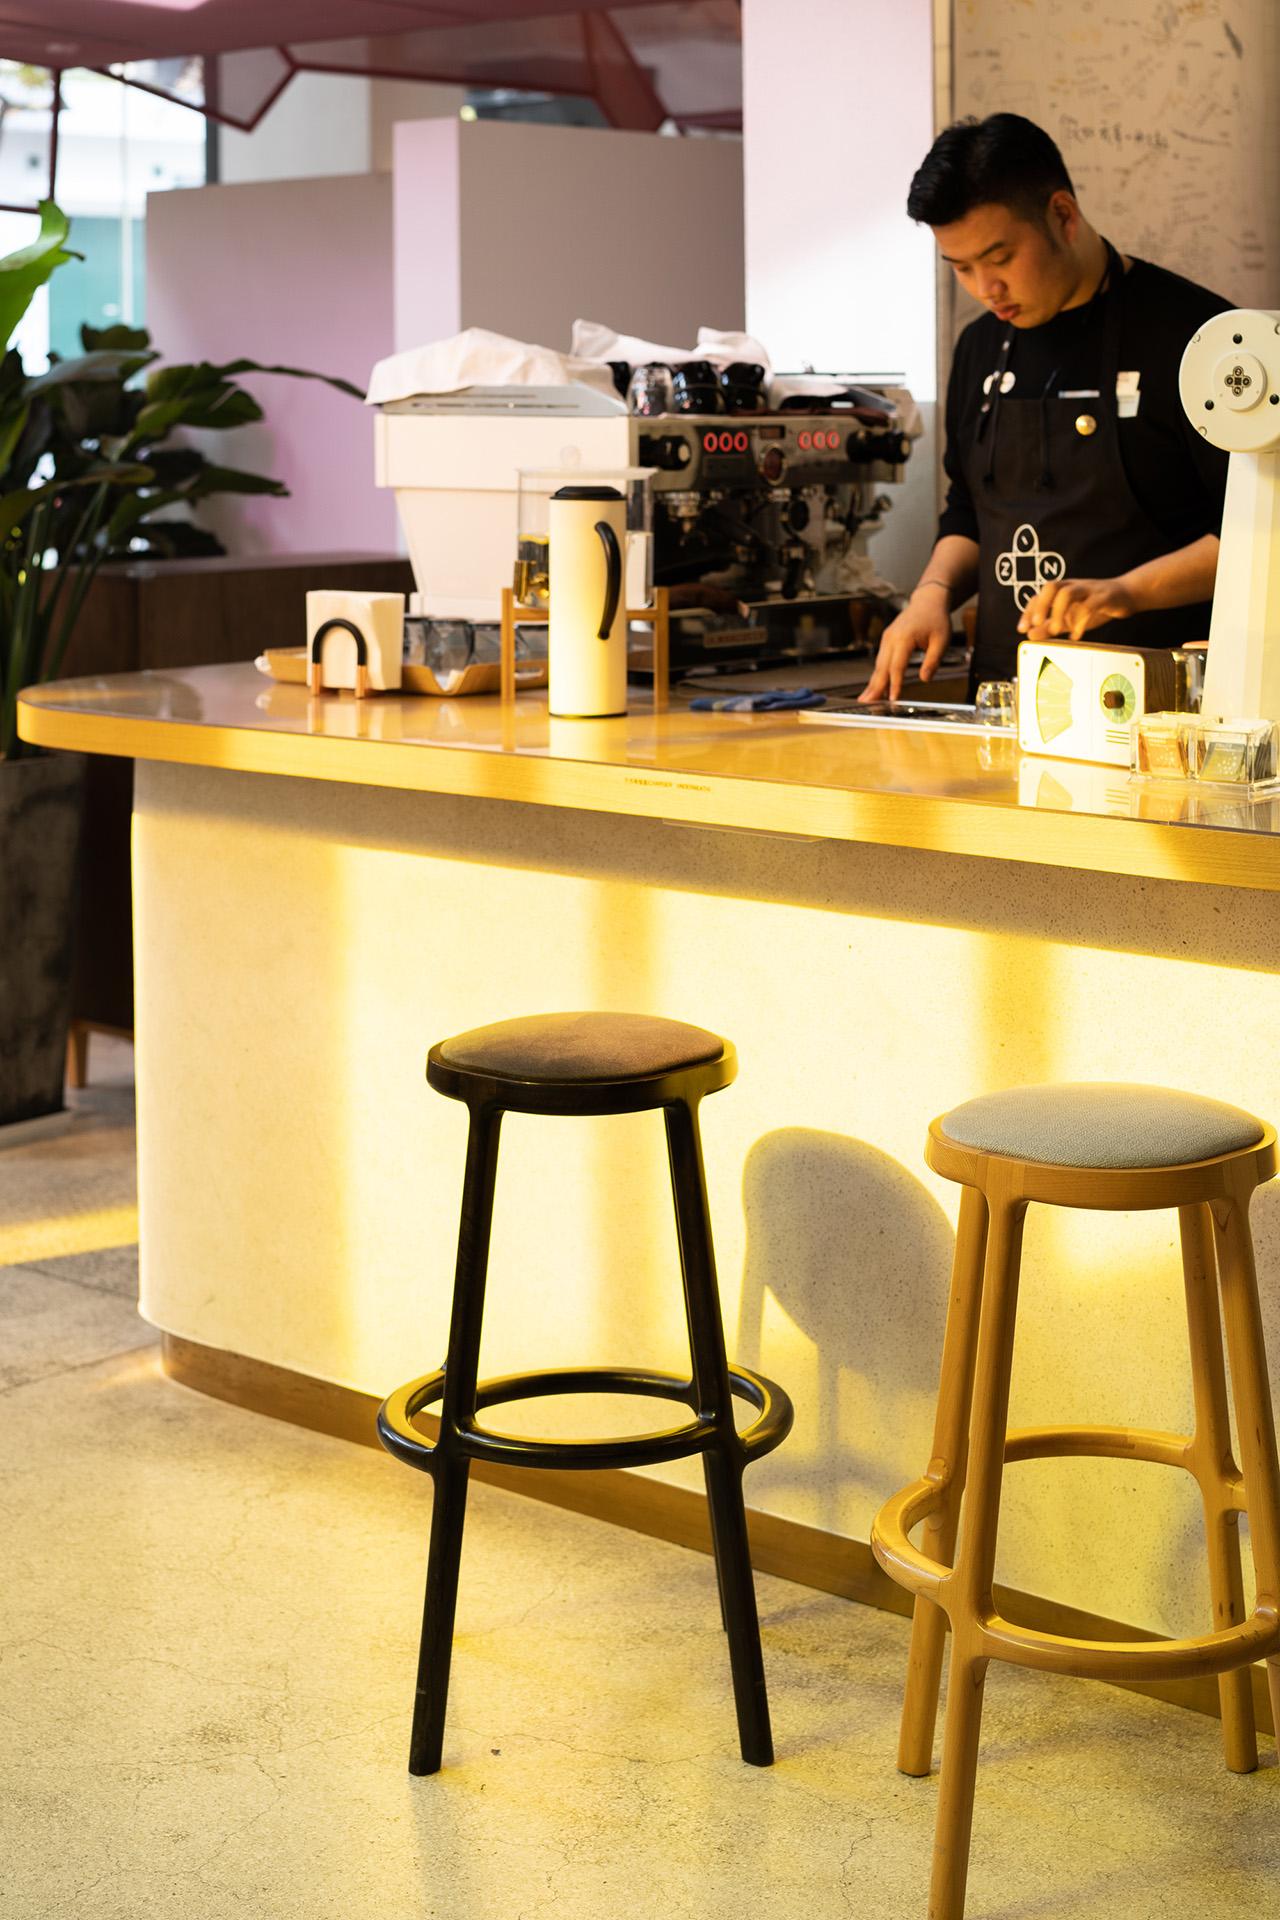 Yellow tinted shadows cast on the café bar counter.